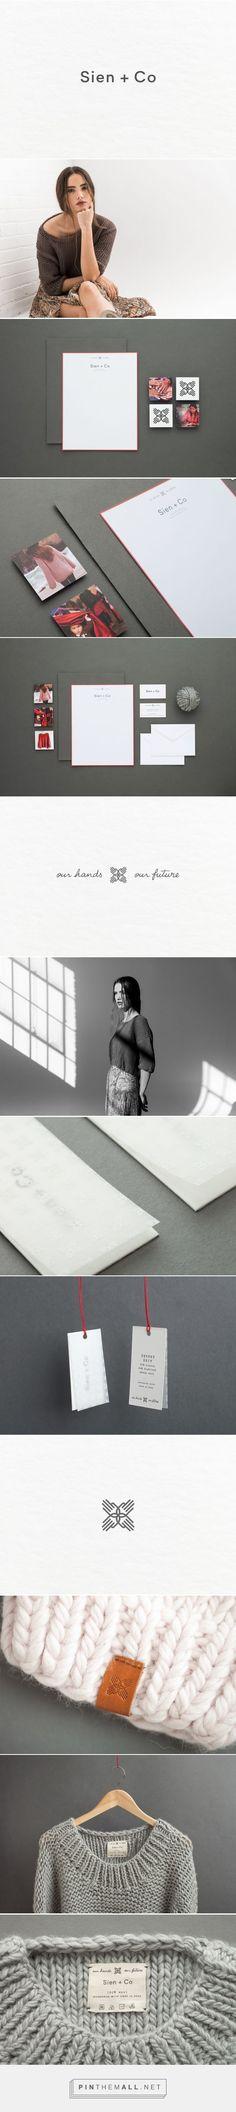 Sien + Co Knit Apparel Branding by Menta | Fivestar Branding Agency – Design and Branding Agency & Curated Inspiration Gallery #fashion #fashionbranding #branding #design #designinspiration